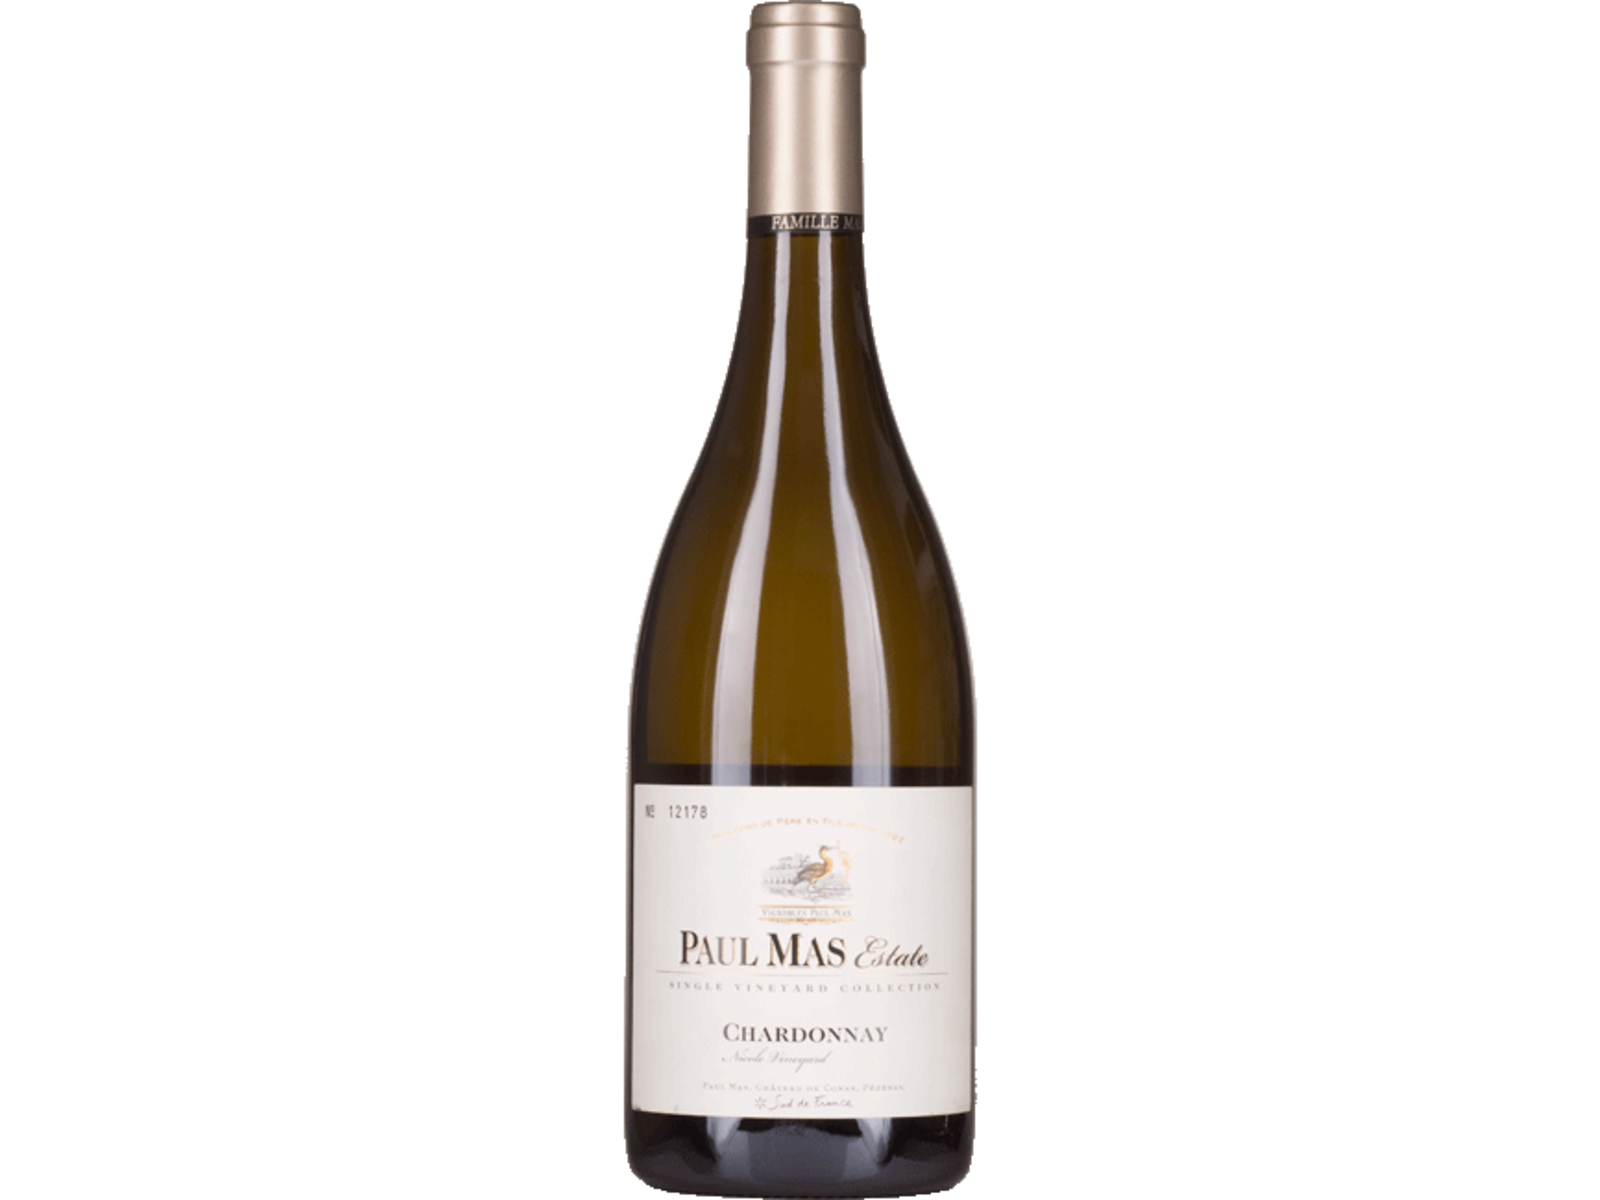 Domaines Paul Mas Paul Mas Estate Chardonnay Single Vineyard Collection